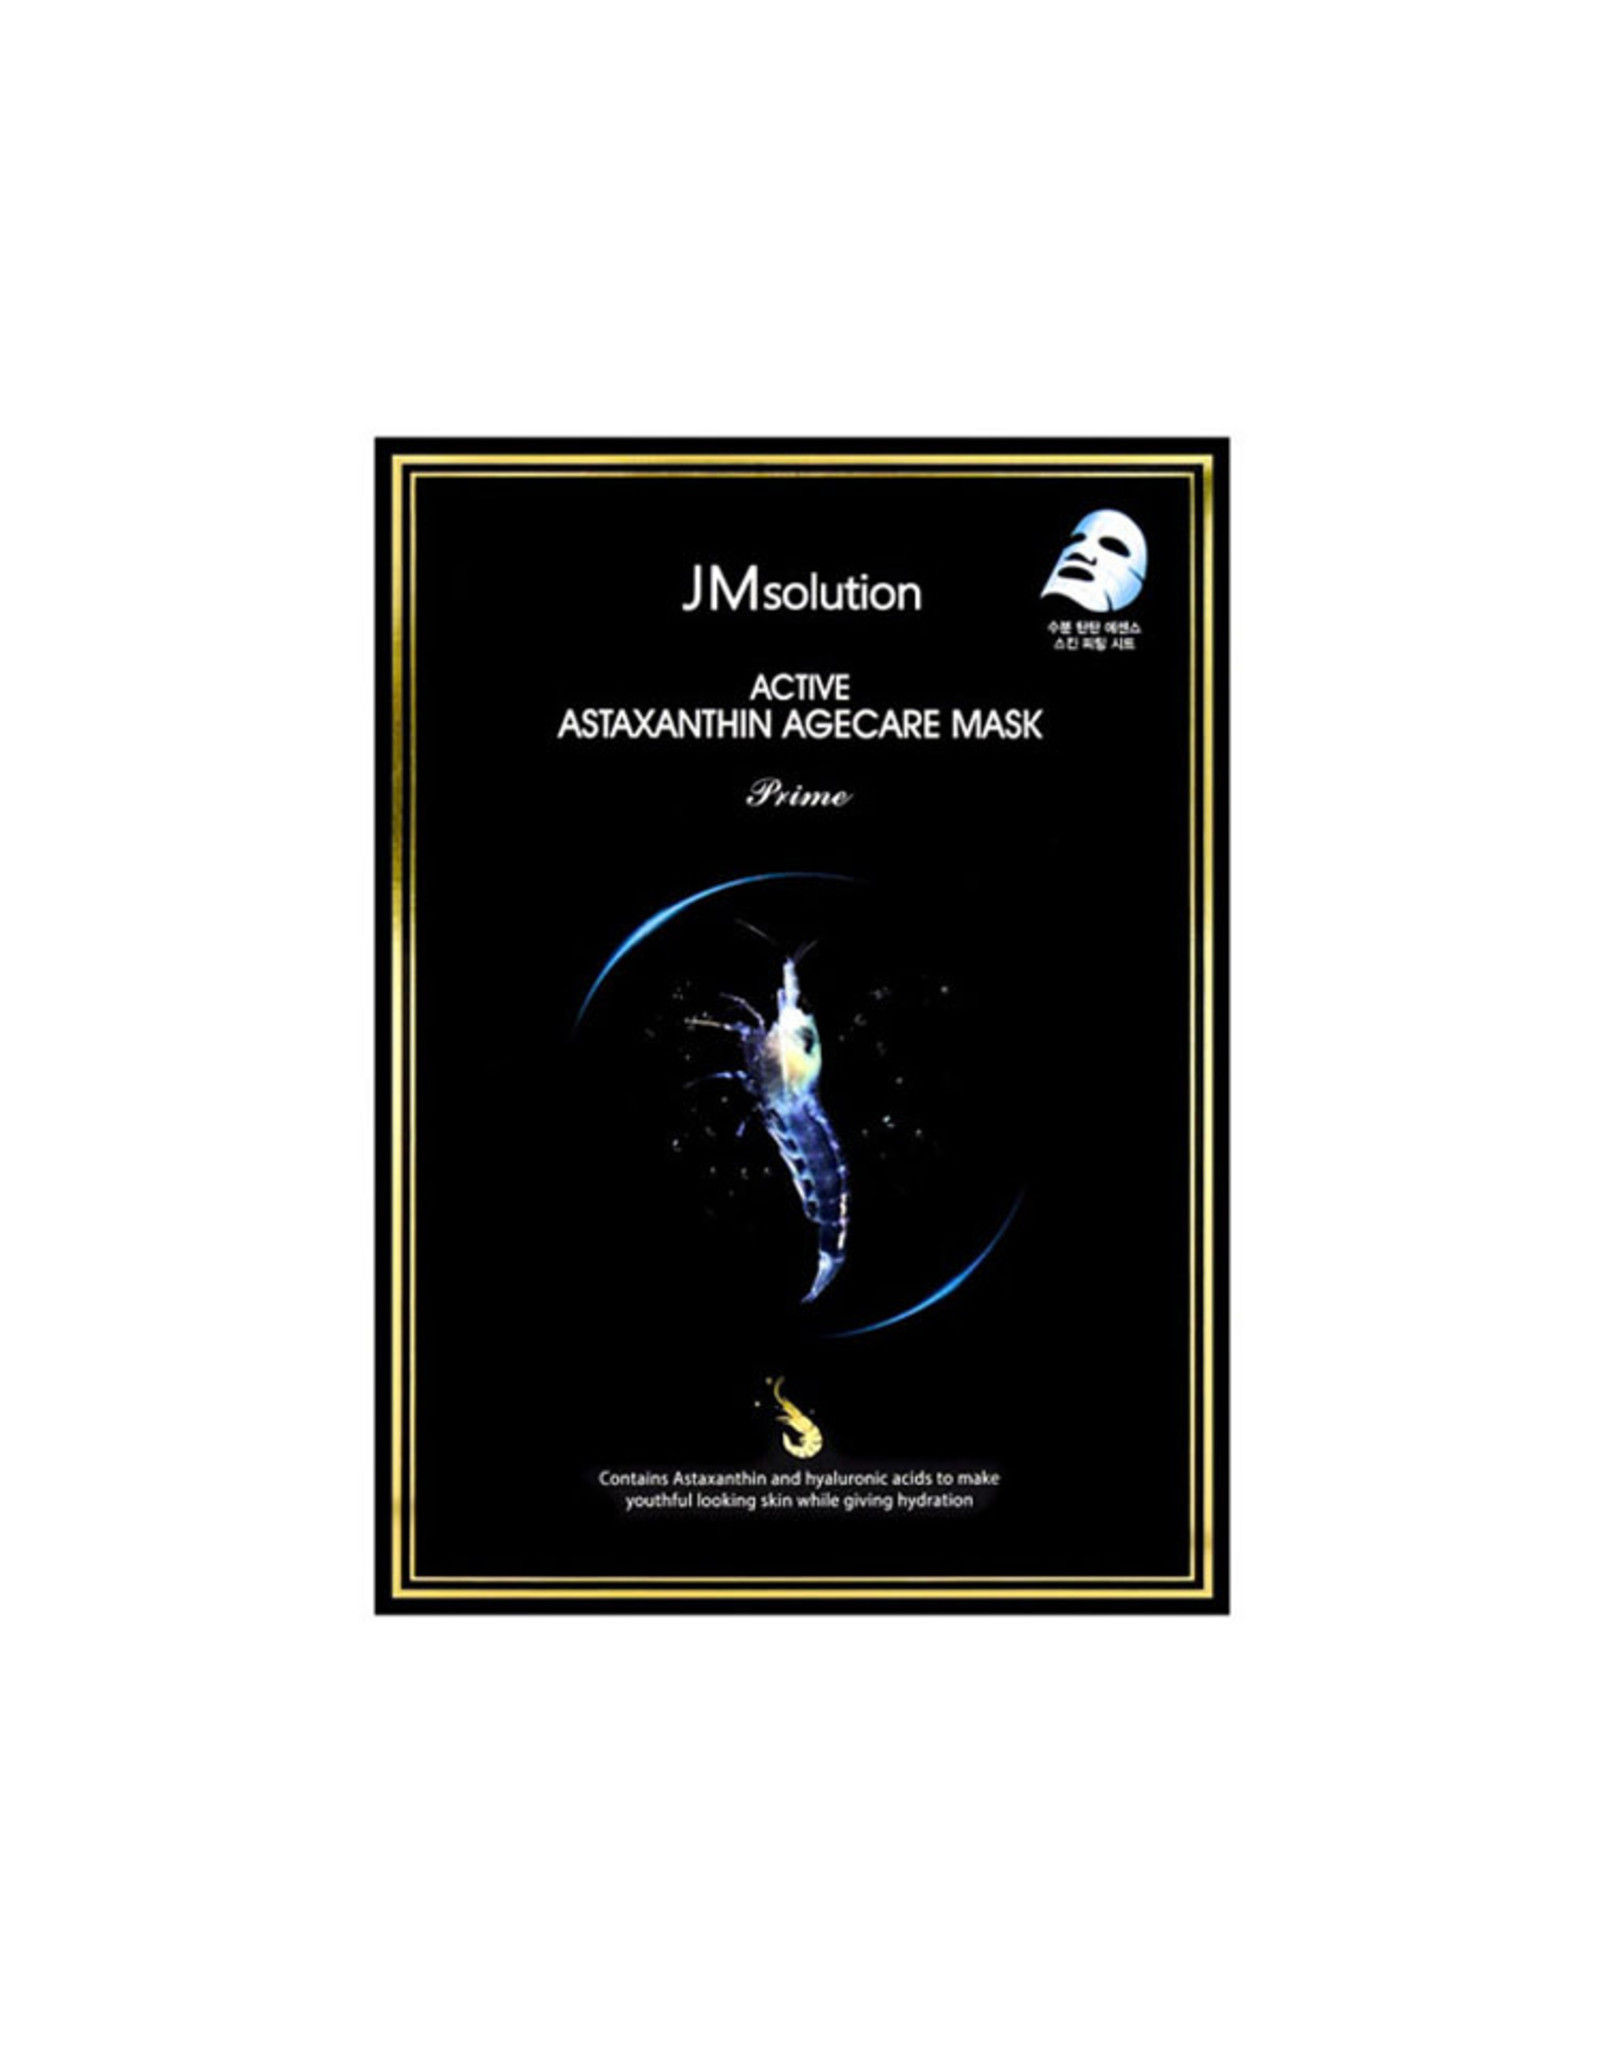 JM Solution JM Solution Active Astaxanthin Agecare Mask